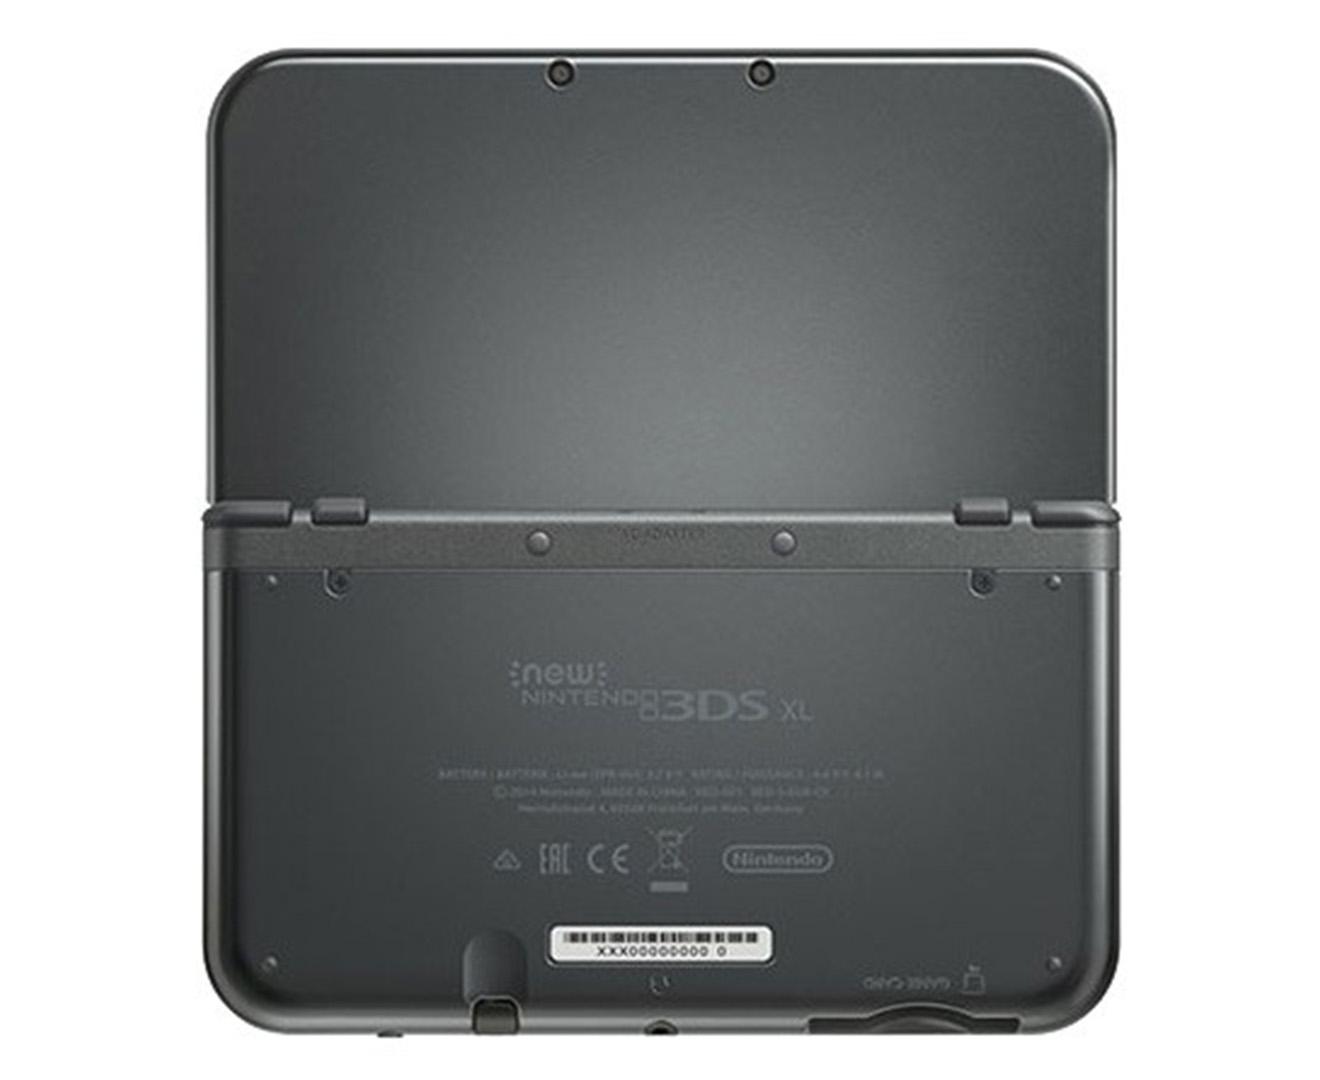 nintendo 3ds xl game console metallic black ebay. Black Bedroom Furniture Sets. Home Design Ideas